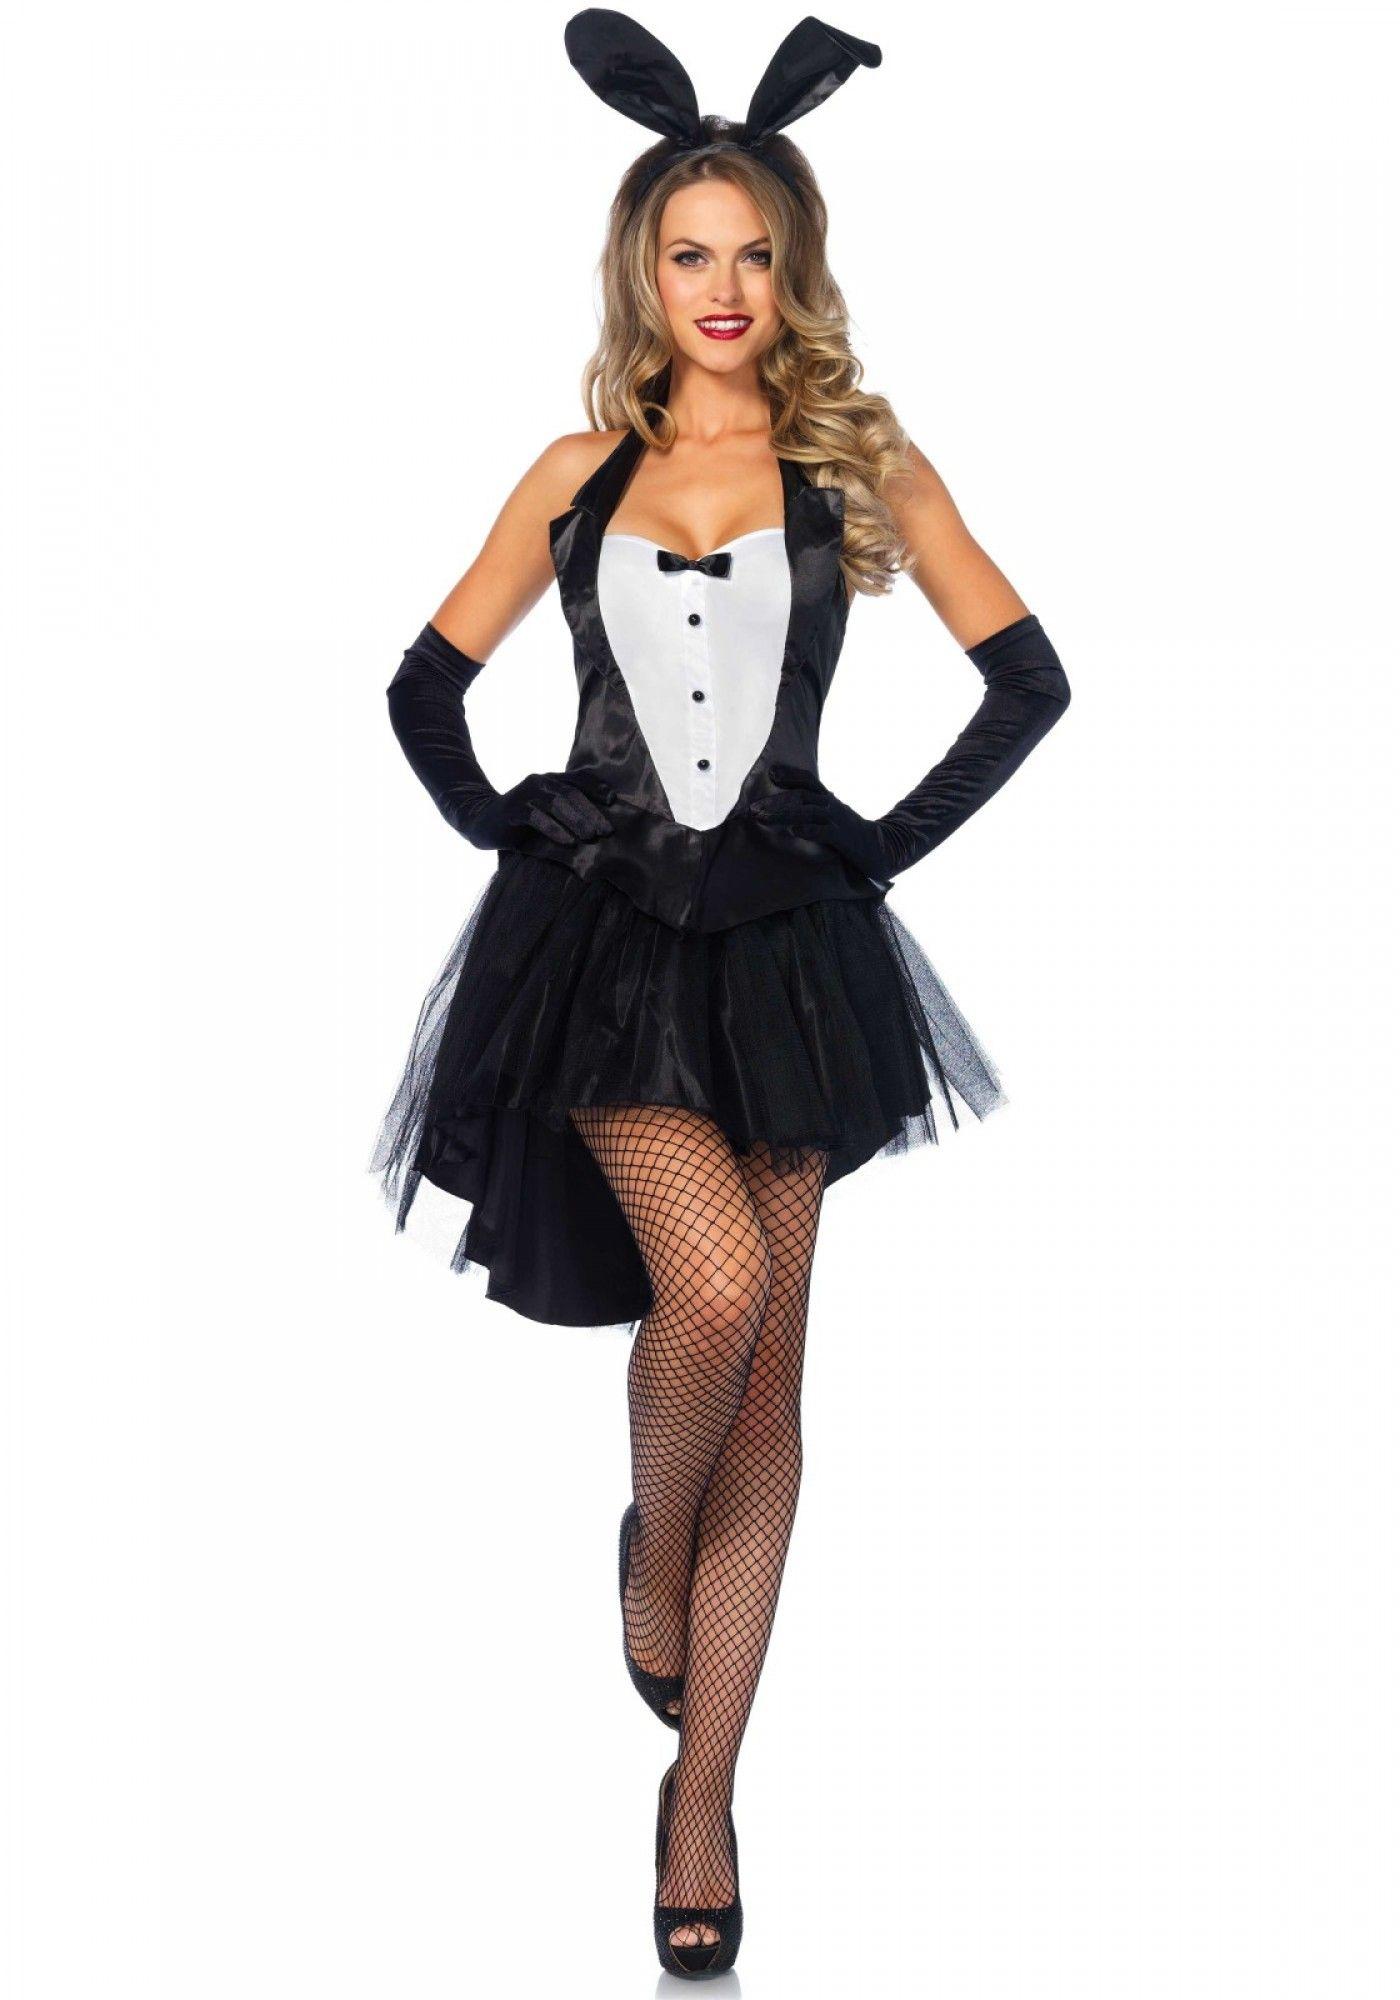 leg avenue 83951 tux tails playboy bunny dress up costume - Halloween Costume Playboy Bunny